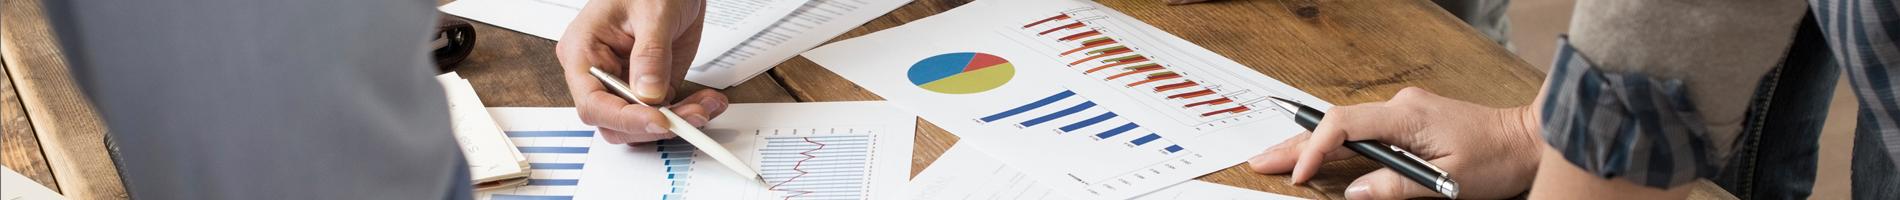 digital marketing agency company management